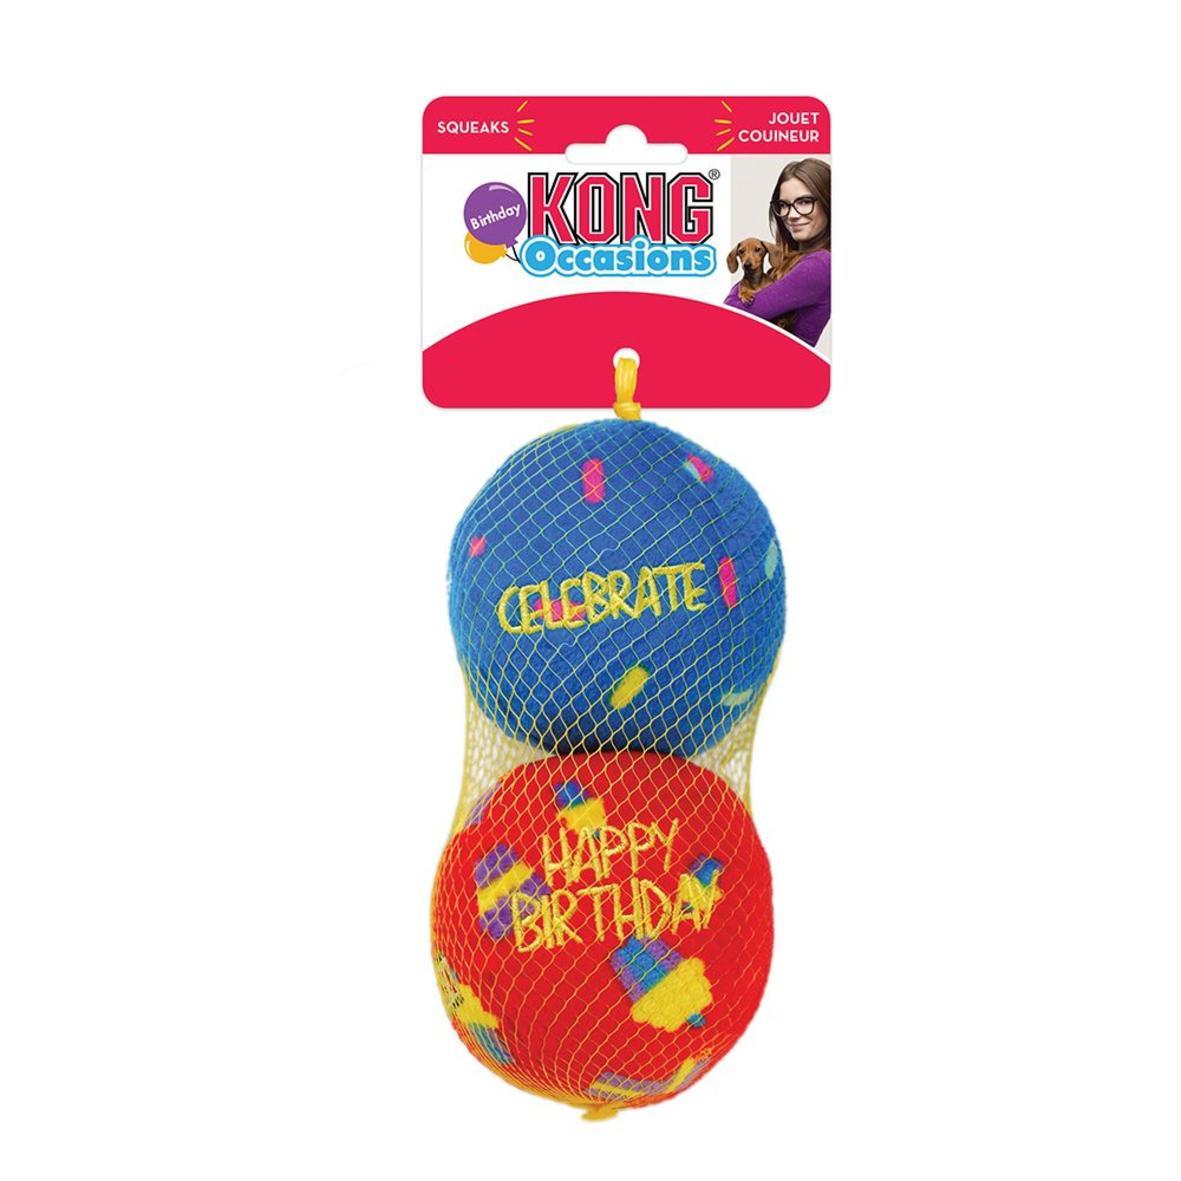 KONG Occasions Birthday Balls 7.5cm 2pk